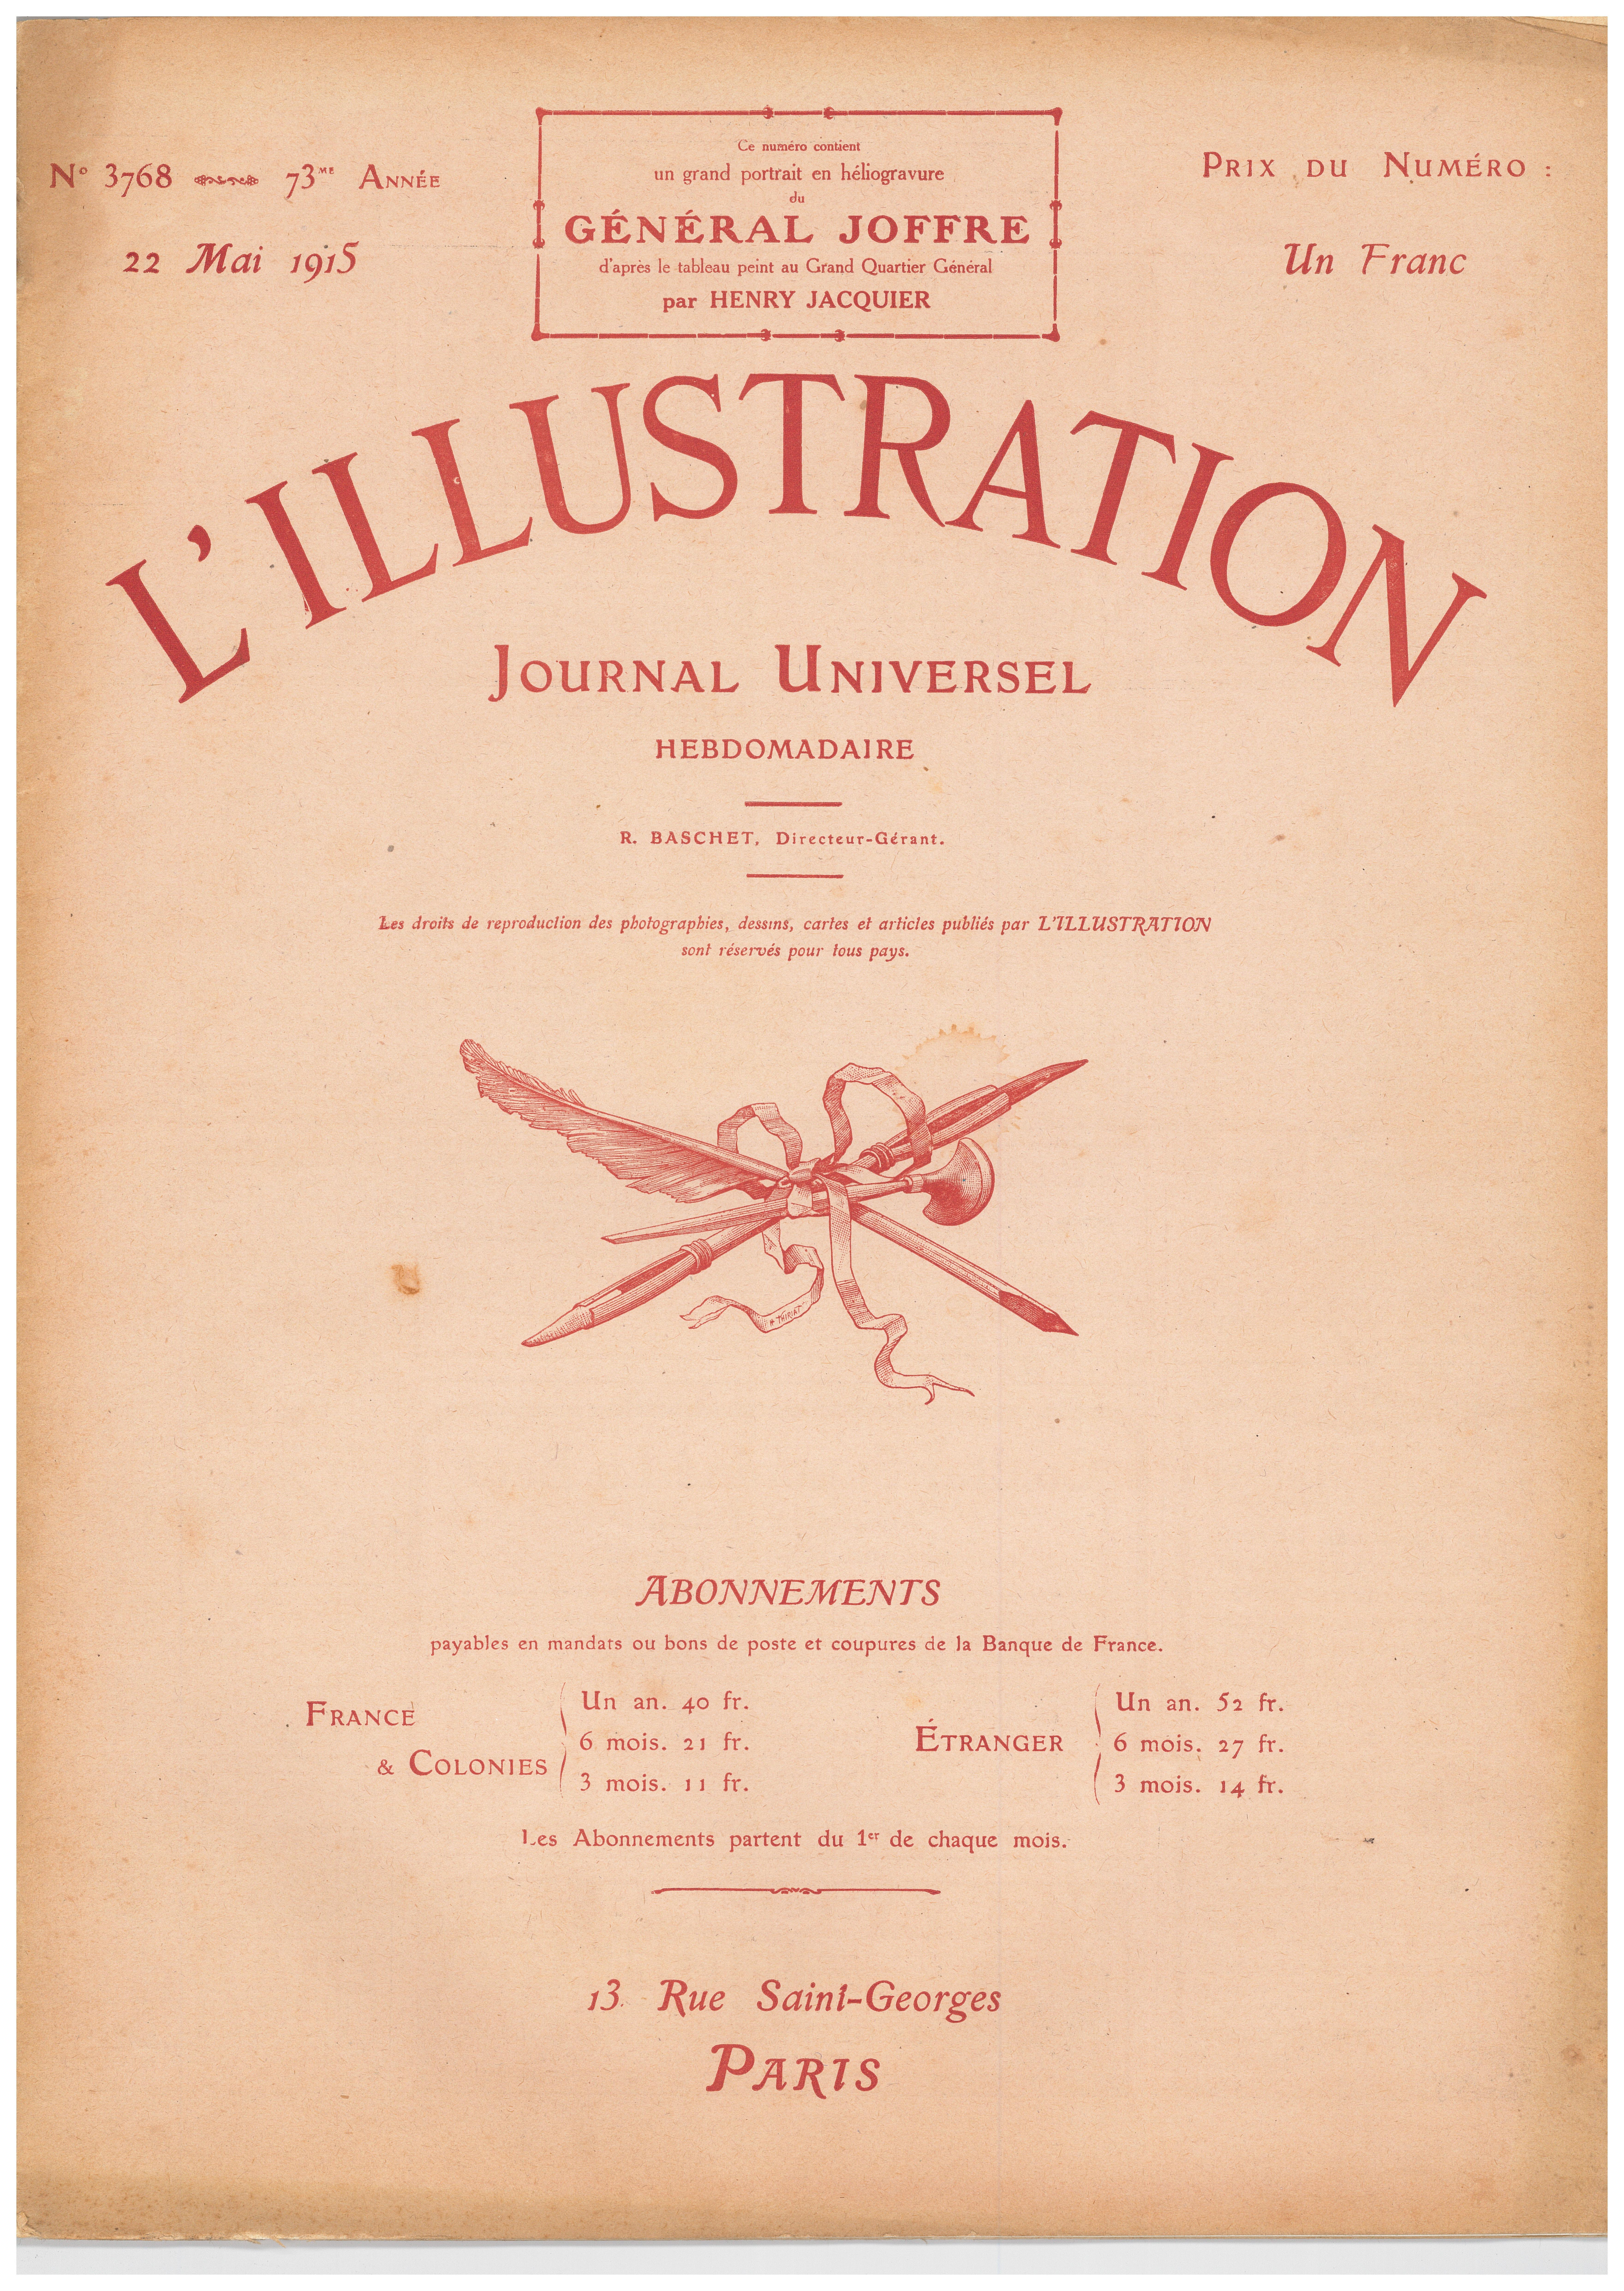 Fileno 3768 22 Mai 1915 Scan 1 Front Coverg Wikimedia Commons